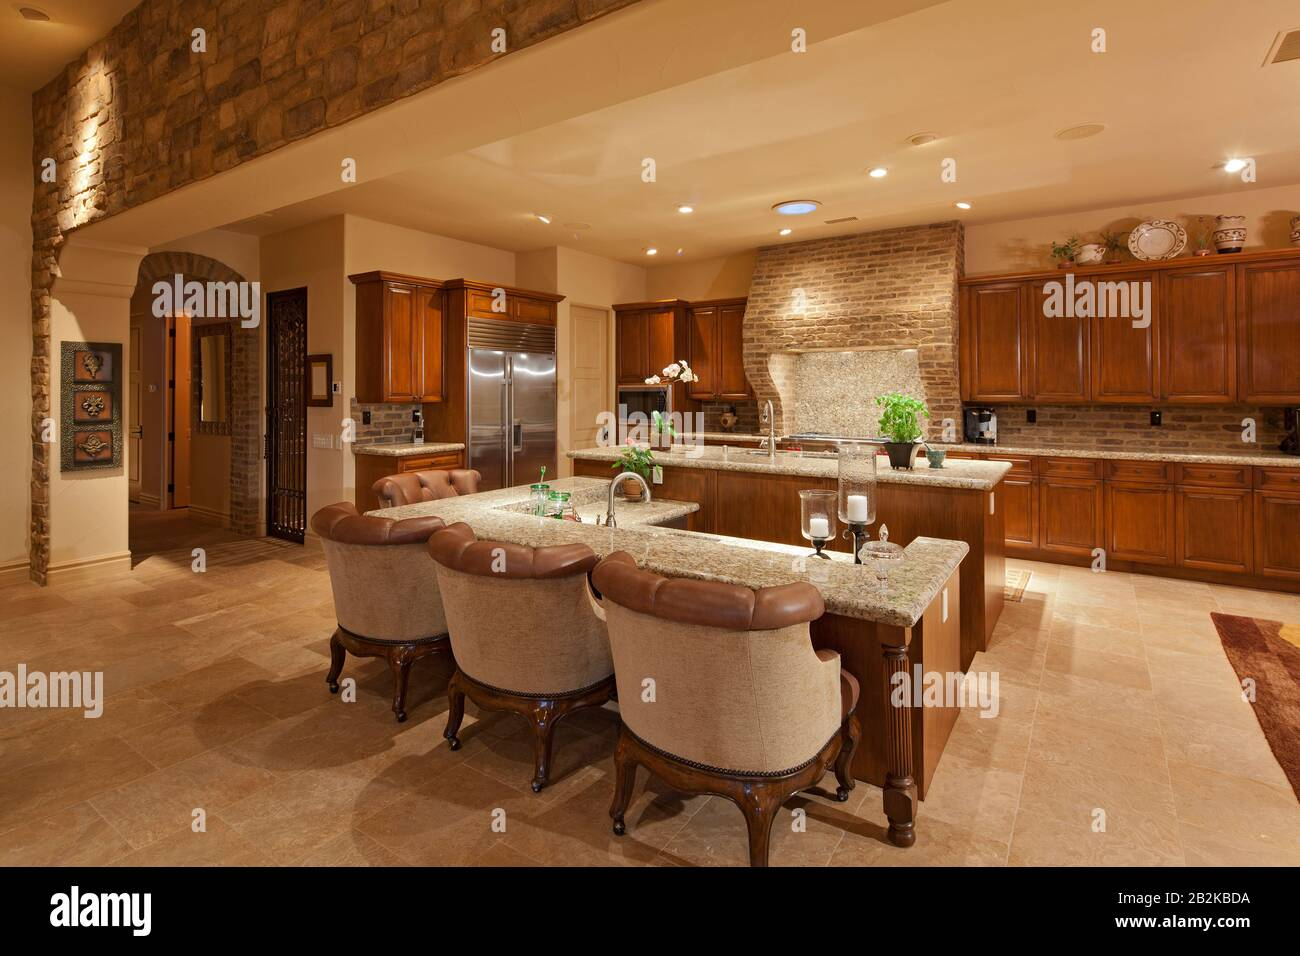 Luxury Open Plan Kitchen With Bar Stock Photo Alamy